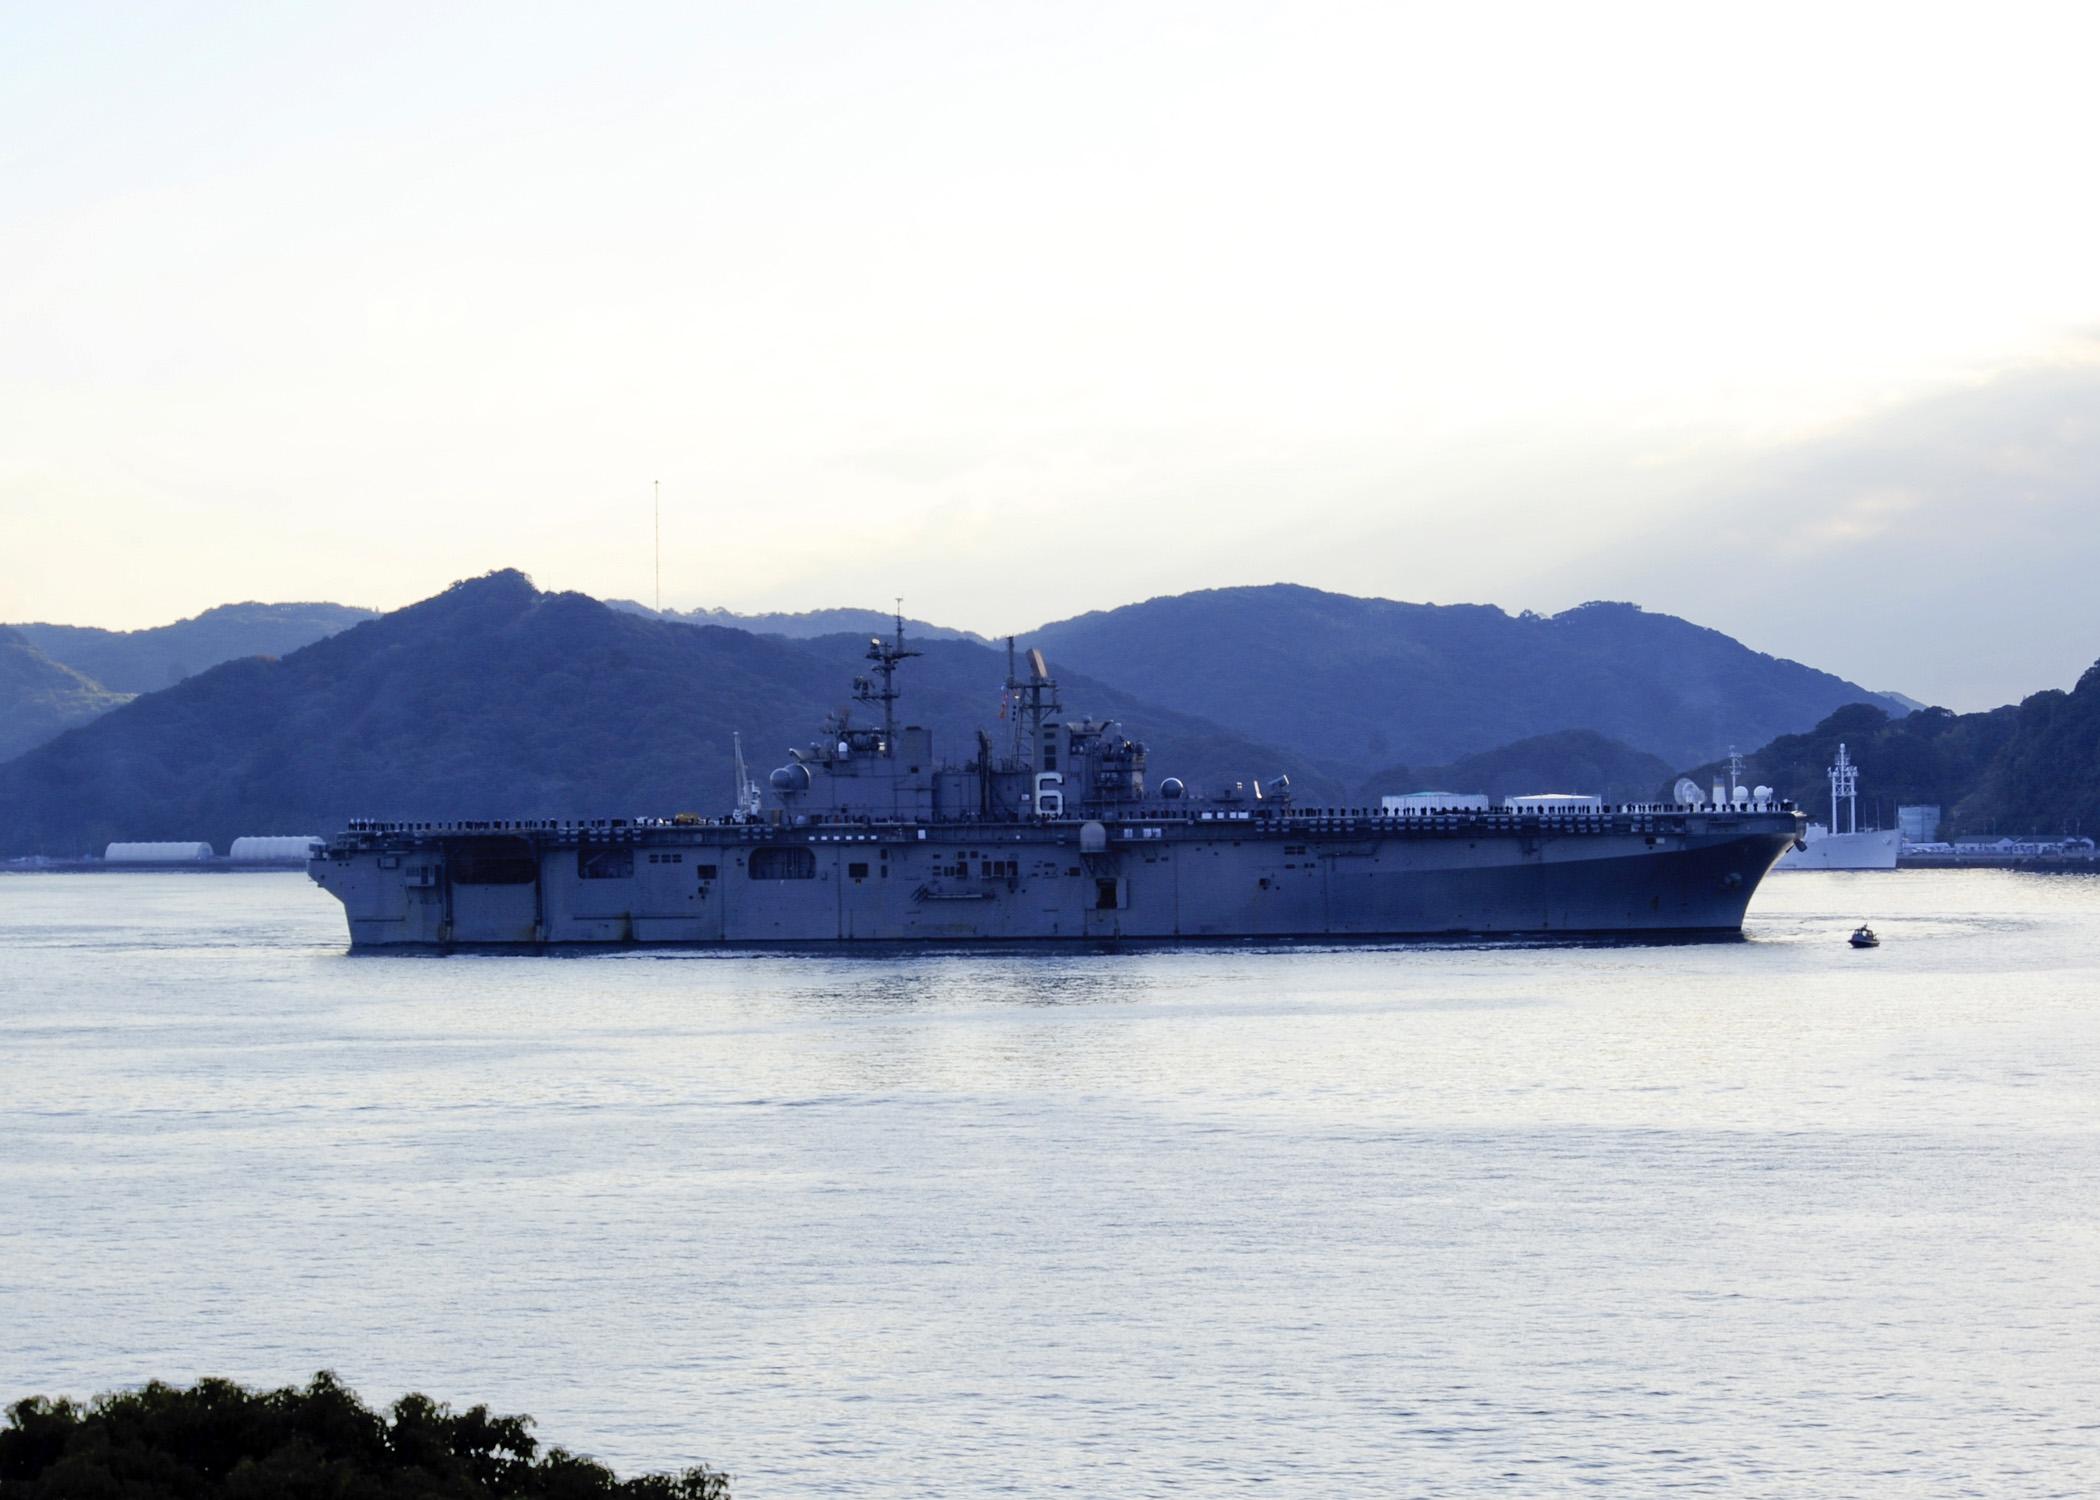 USS BONHOMME RICHARD LHD-6 Sasebo 03.12.2012Bild: U.S. Navy